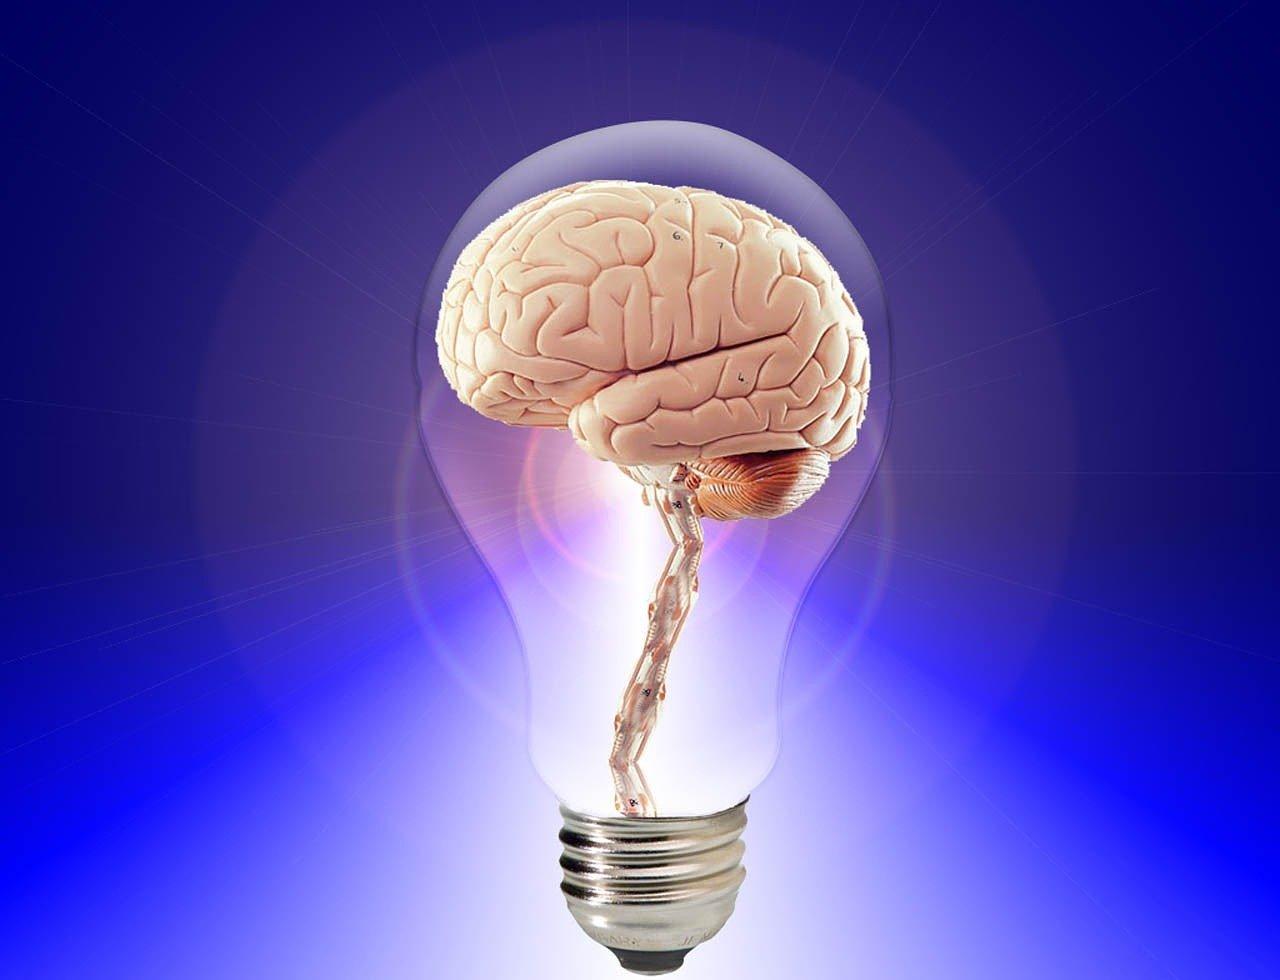 brain 20424 1280 1